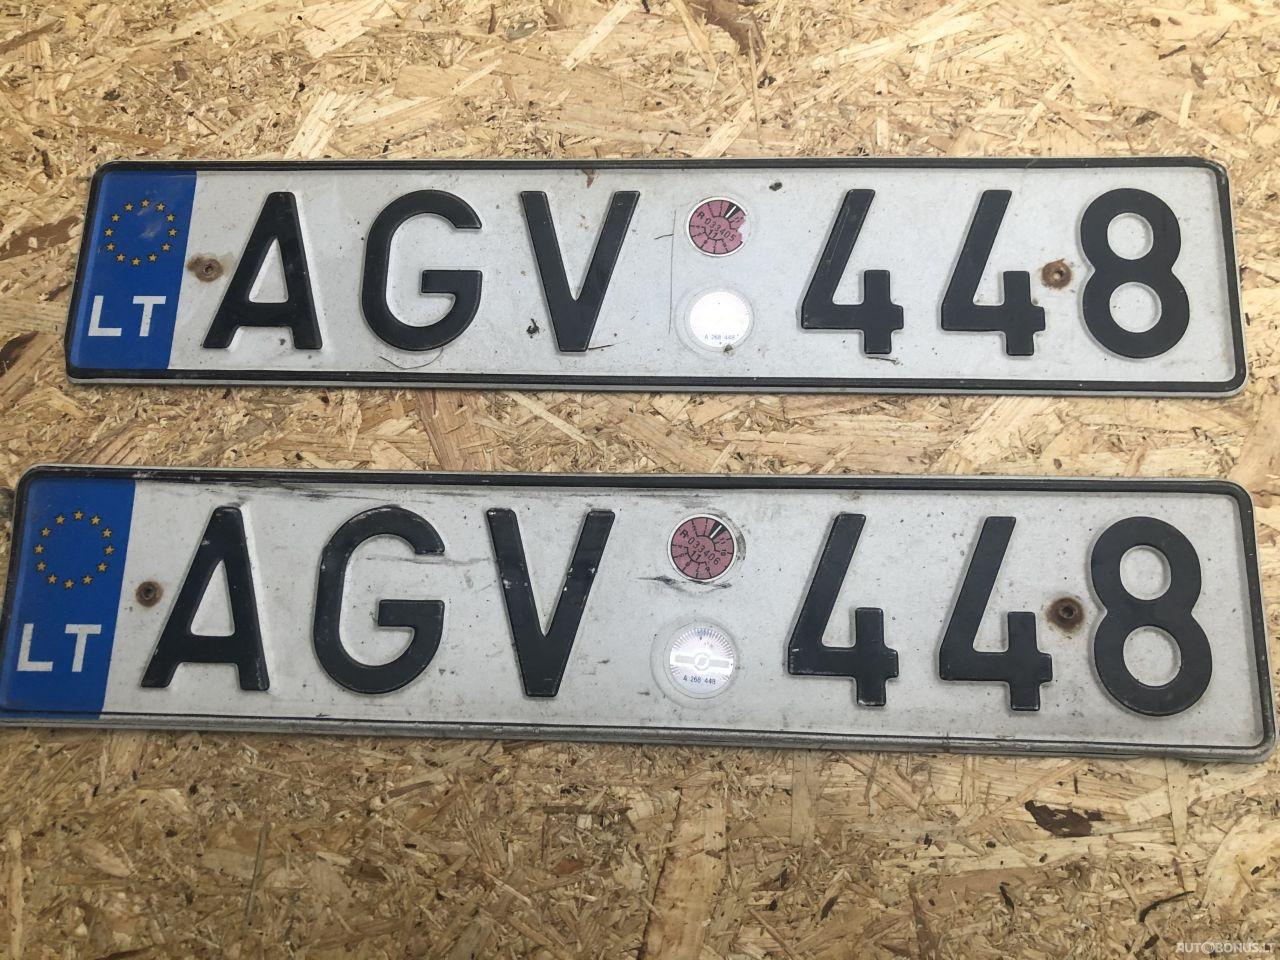 AGV448